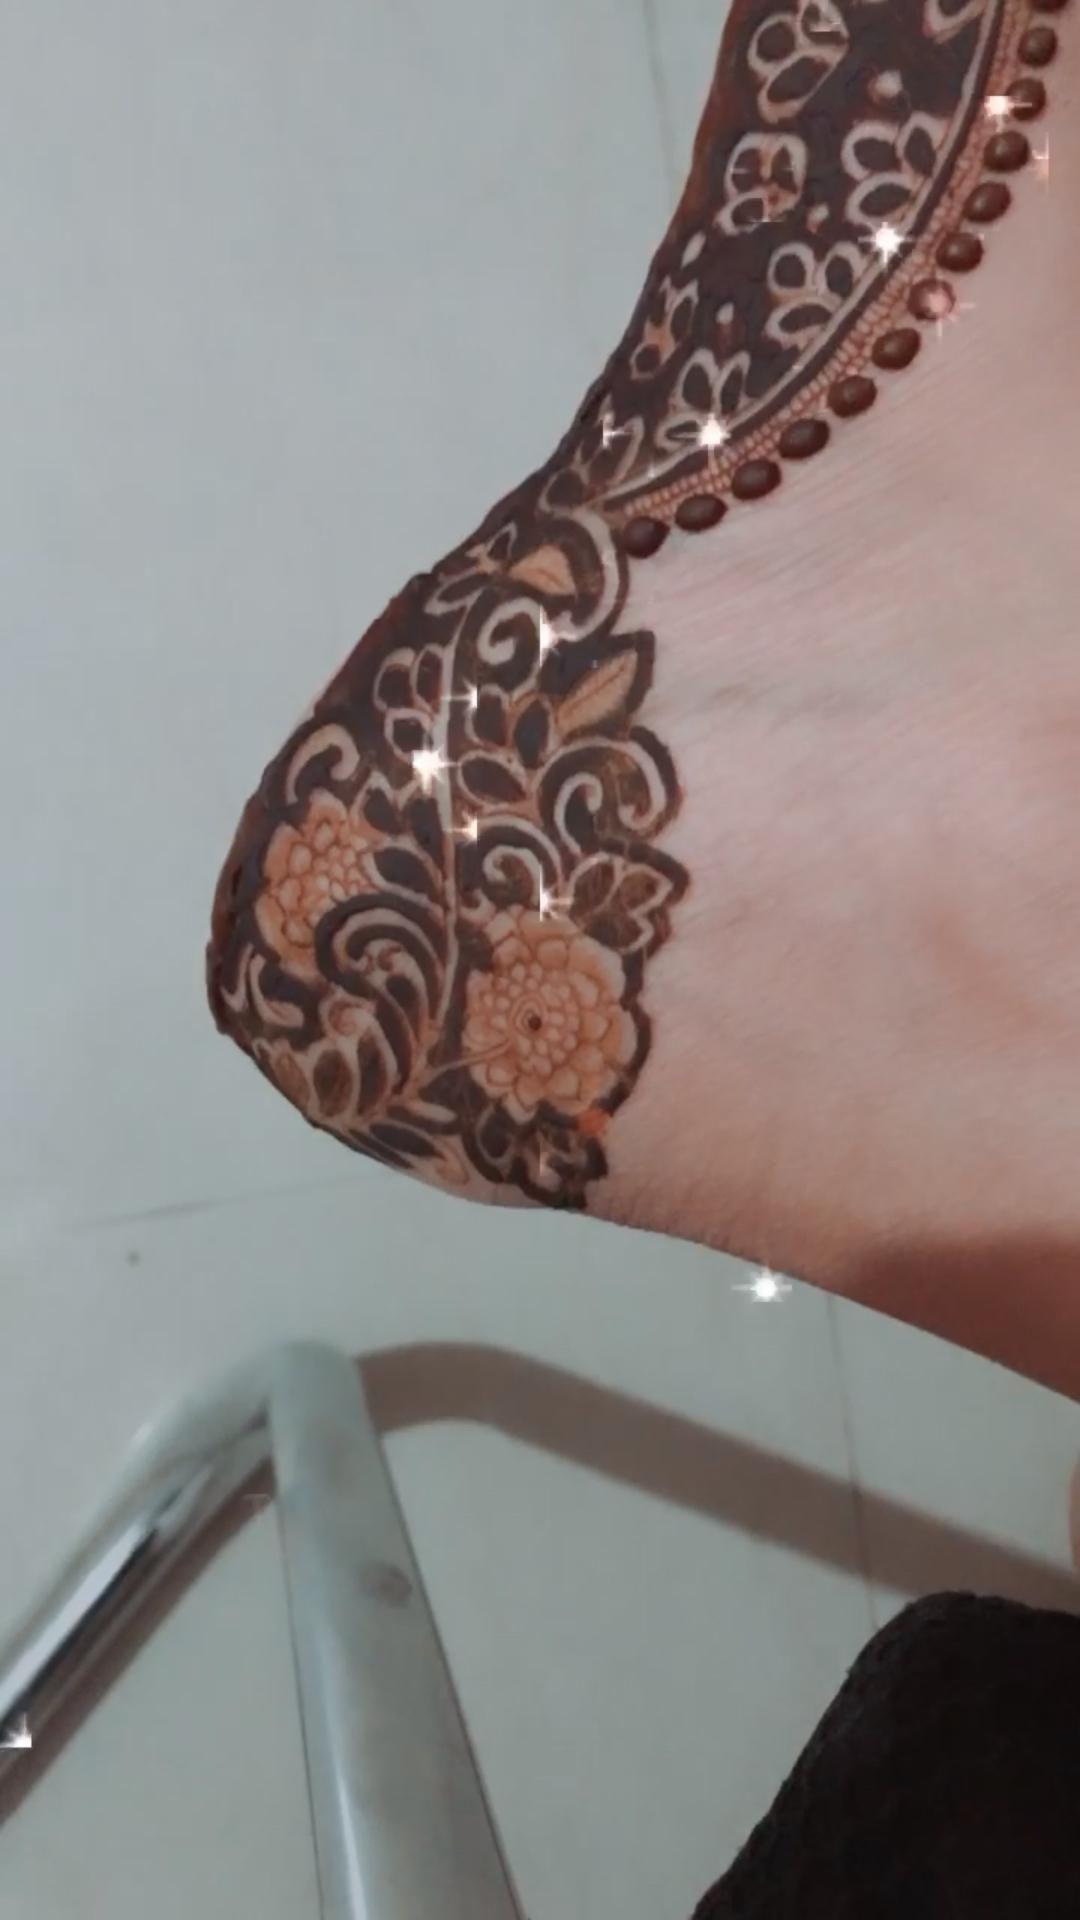 Legs creation ✍️